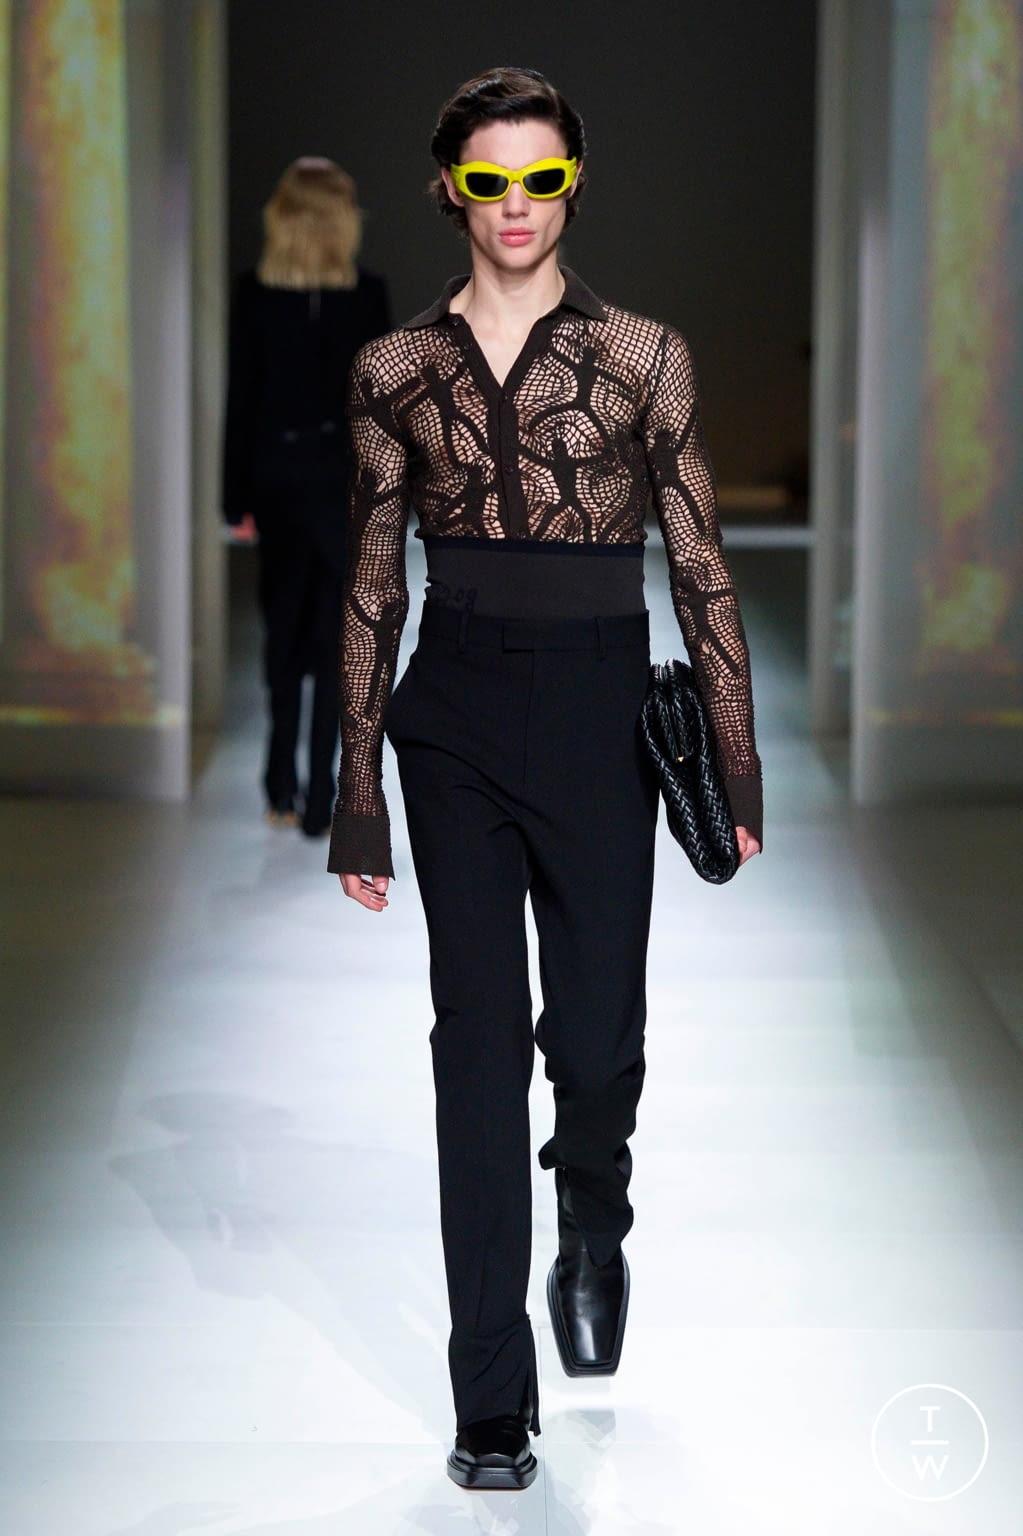 Fashion Week Milan Fall/Winter 2020 look 11 from the Bottega Veneta collection 女装